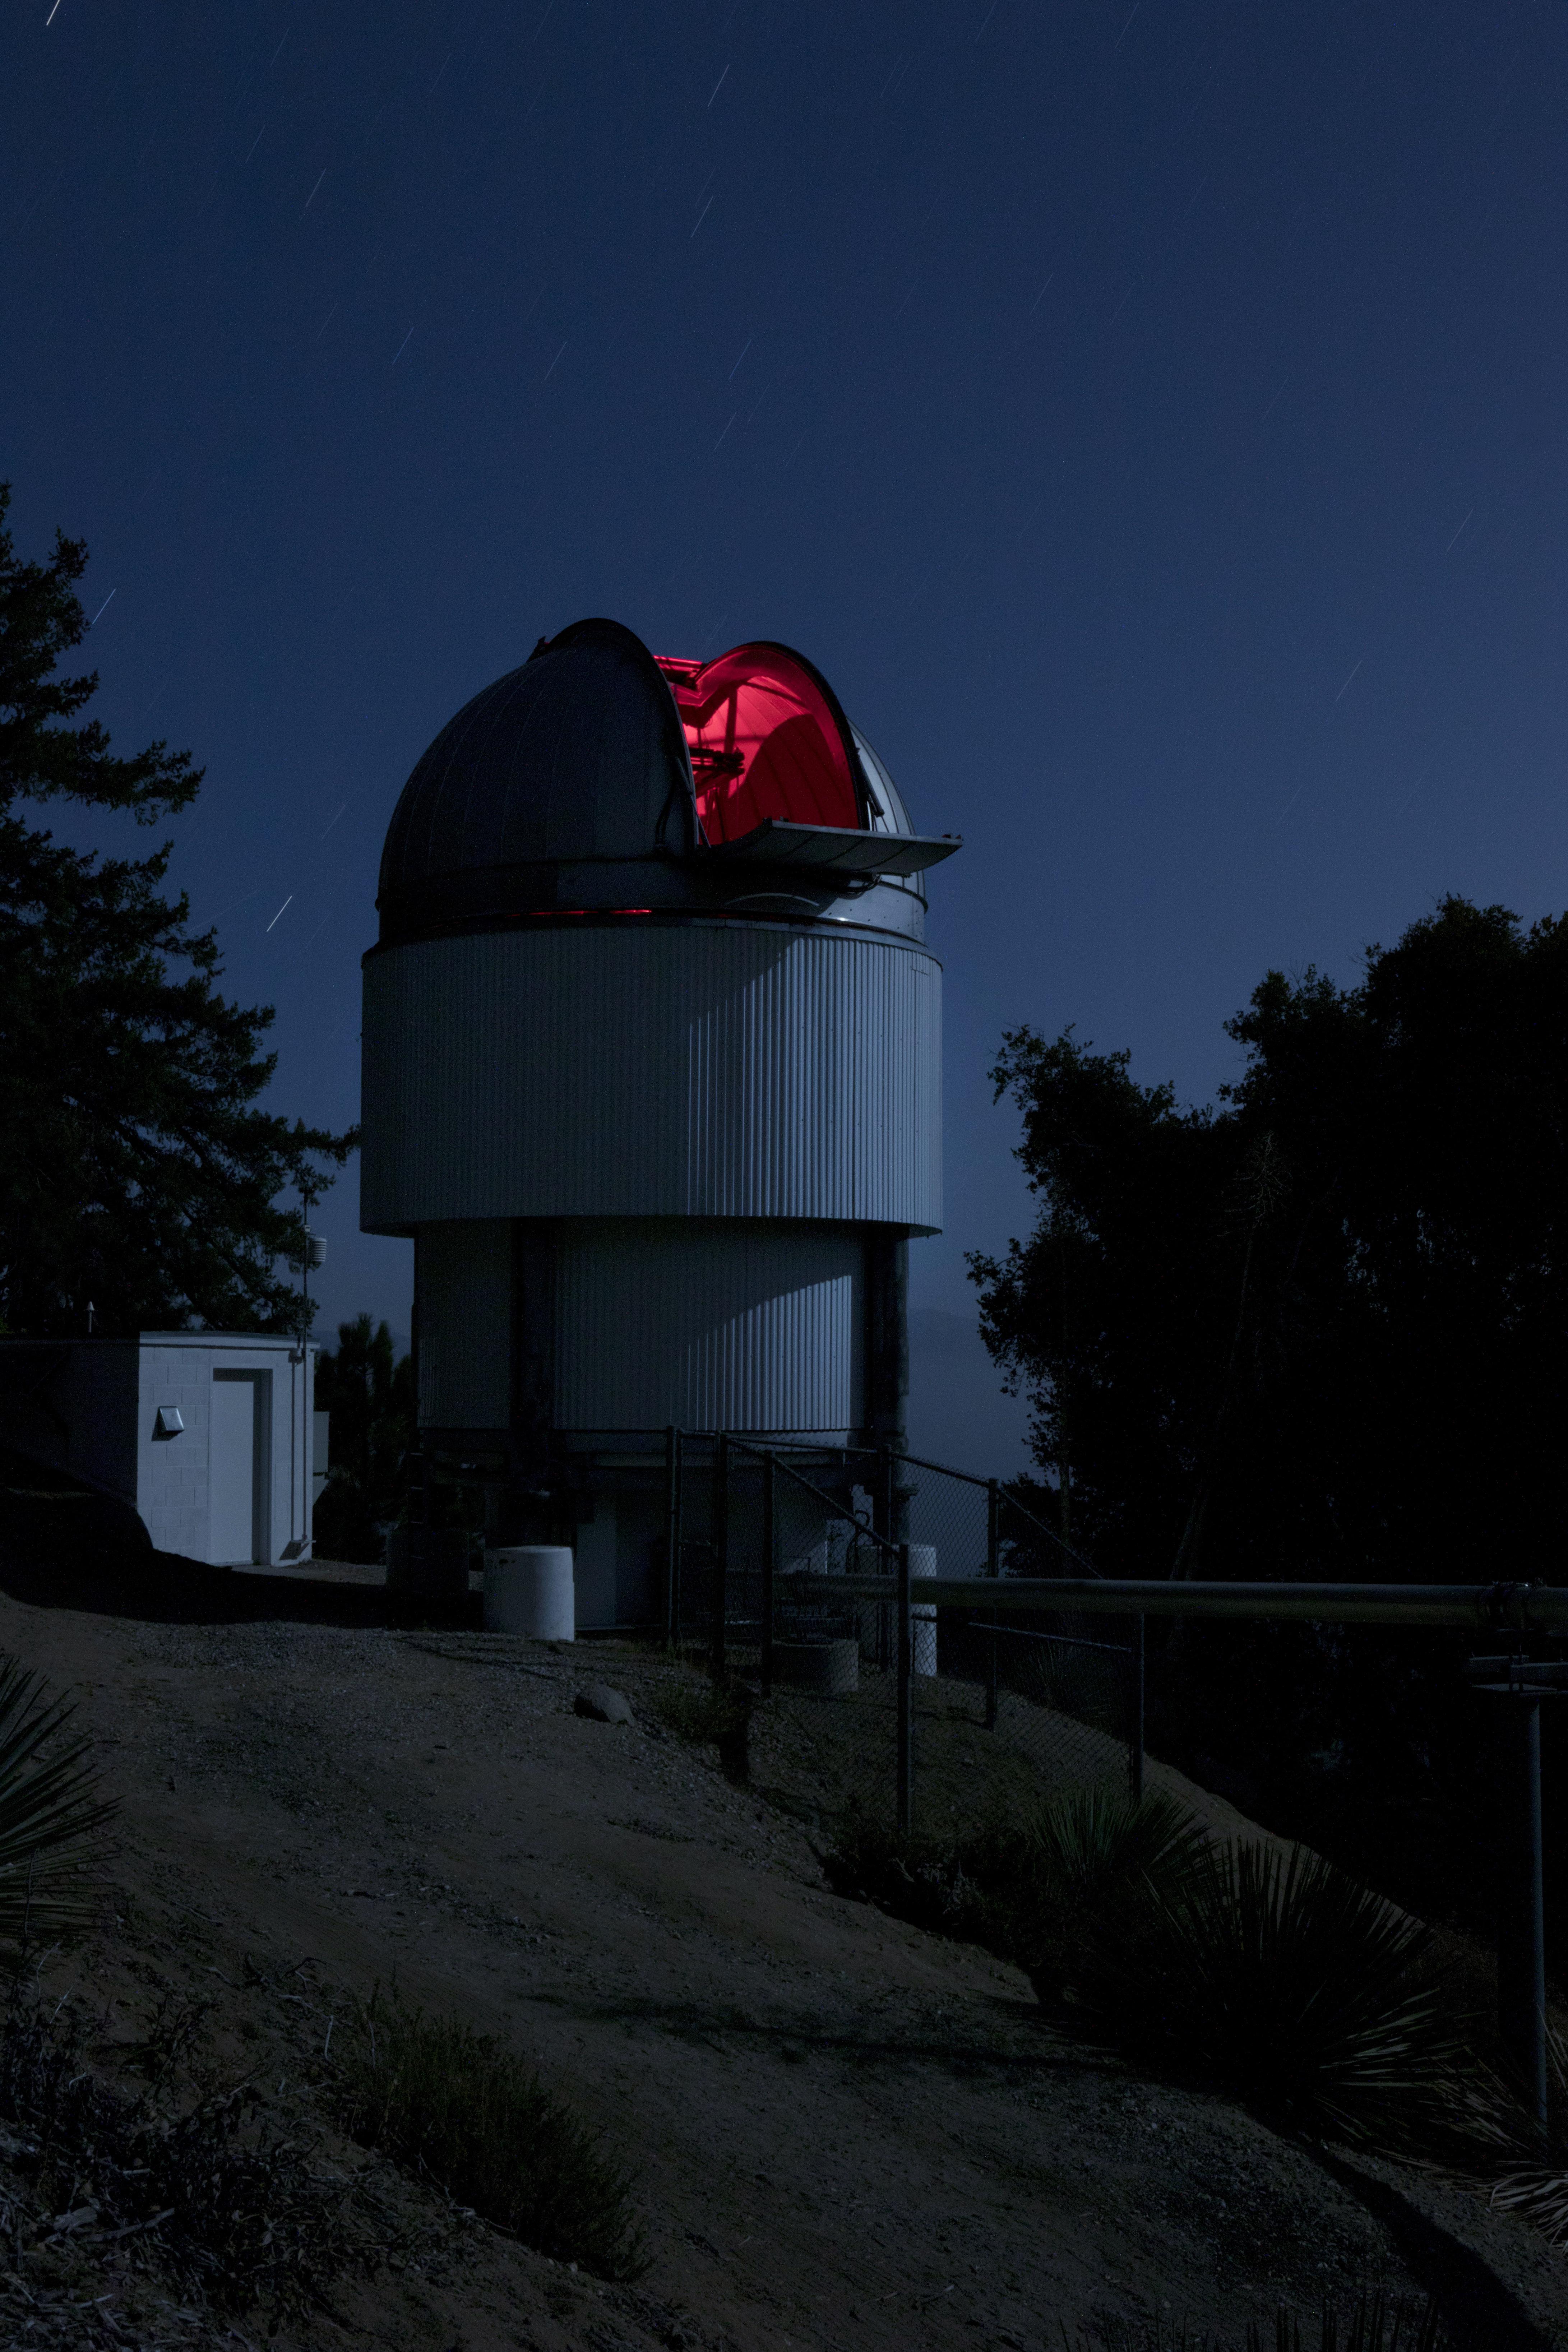 Night time at the E1 telescope.